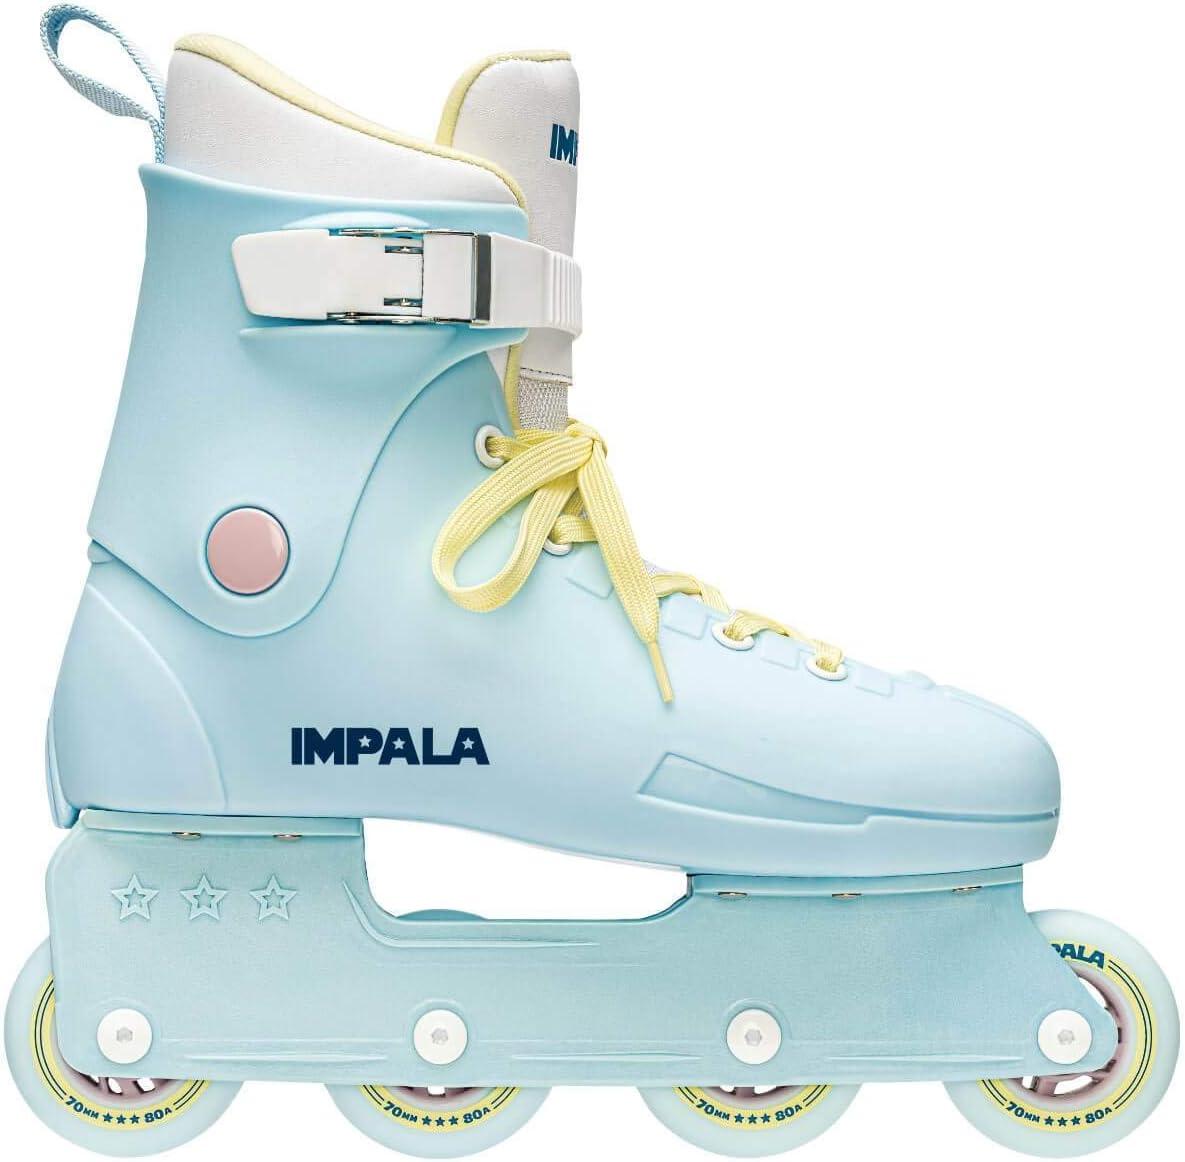 Impala Lightspeed Inline Skate - Sky Blue/Yellow : Sports & Outdoors